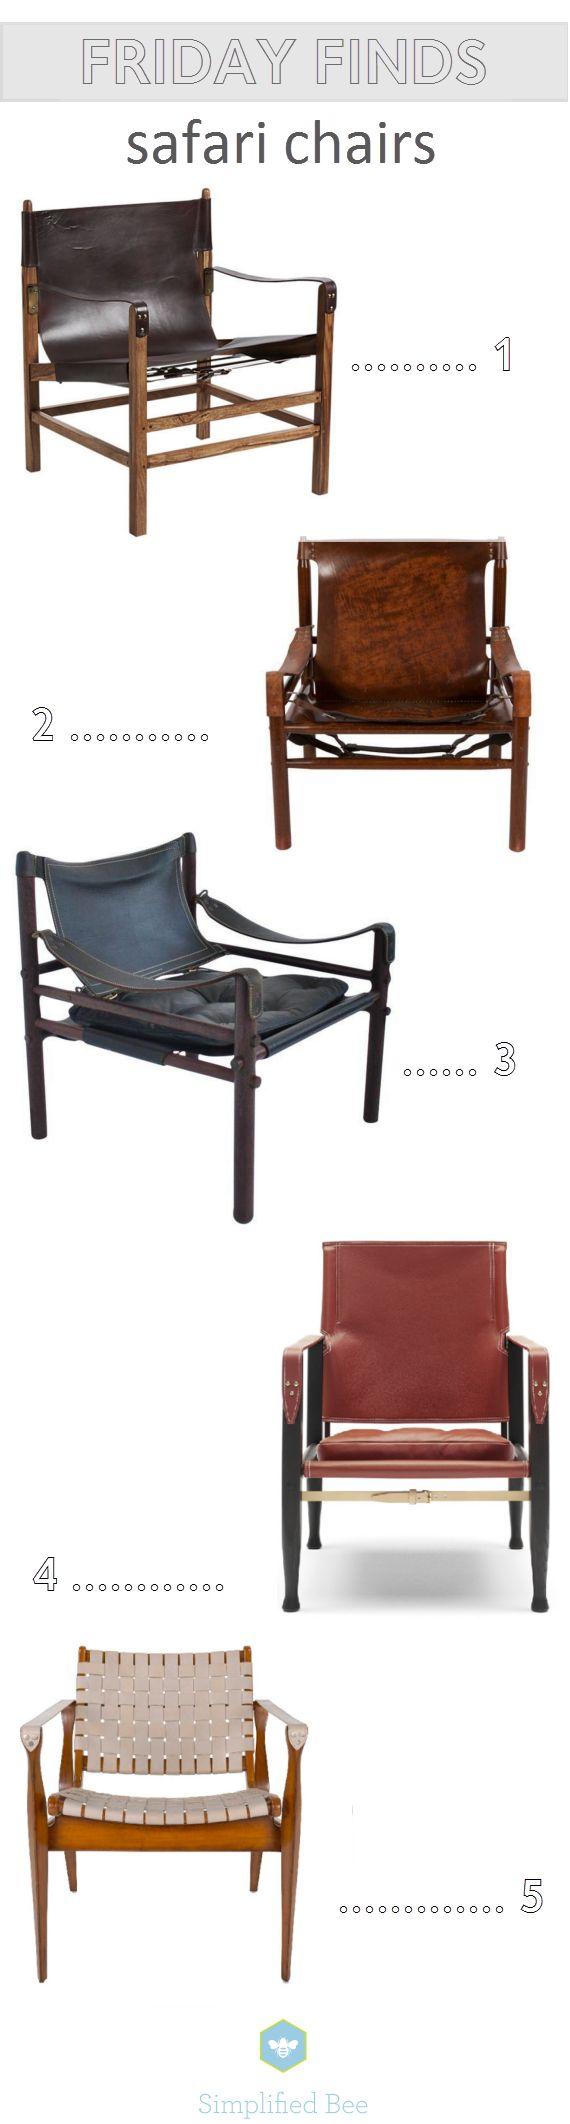 leather safari chairs // via @simplifiedbee